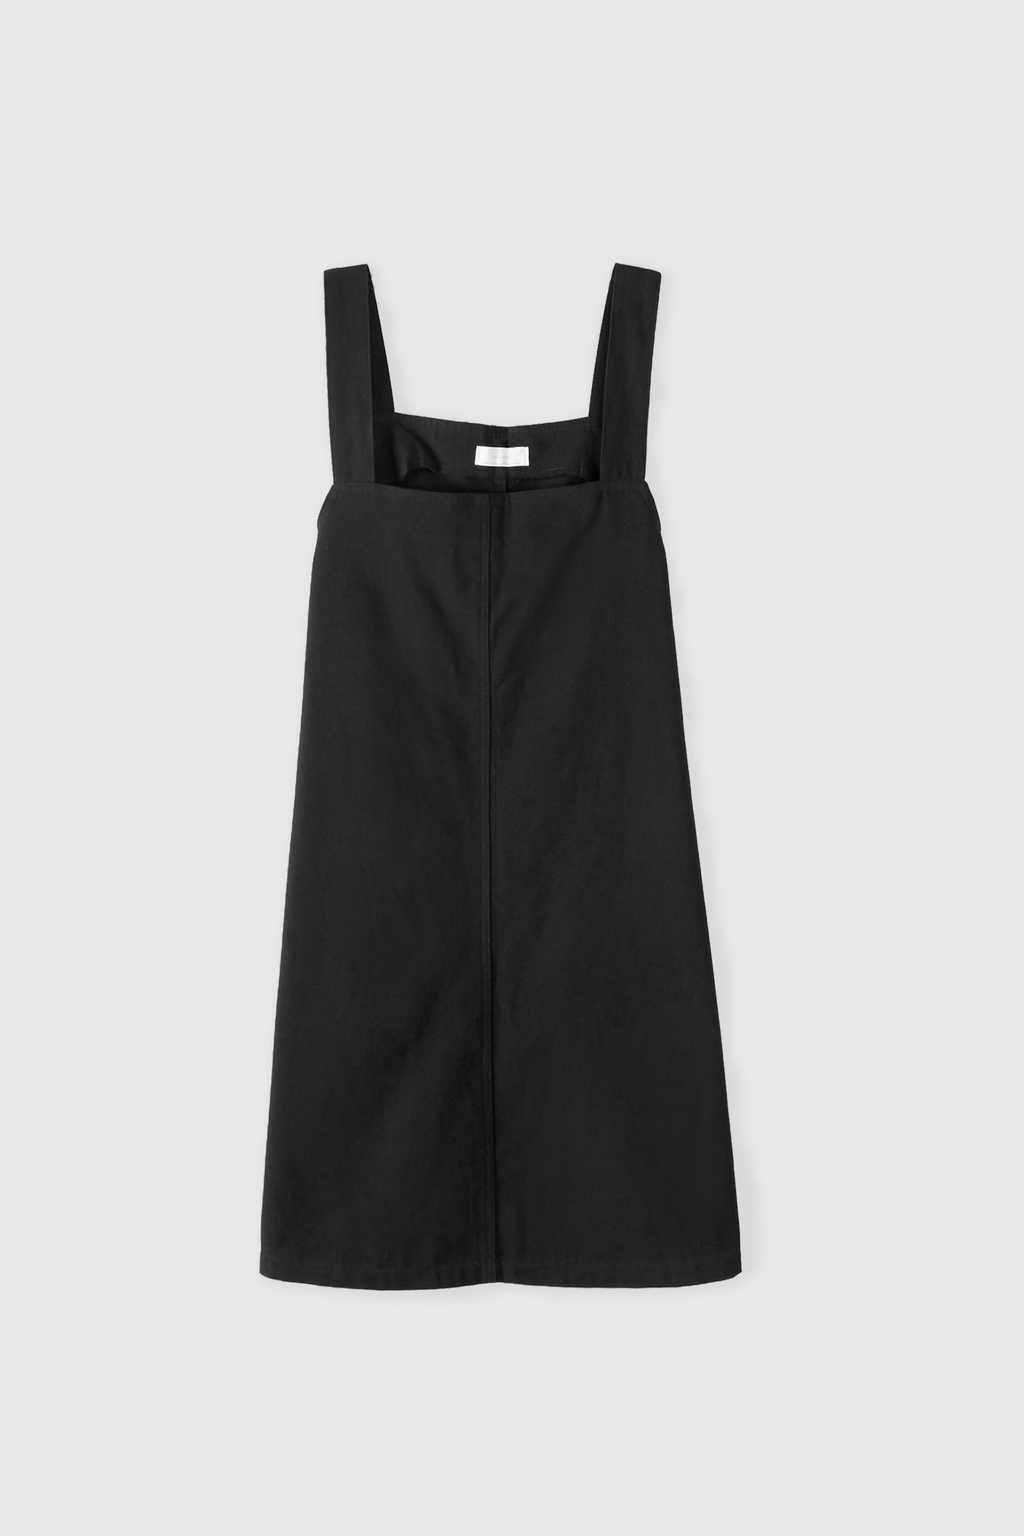 Dress J009 Black 5